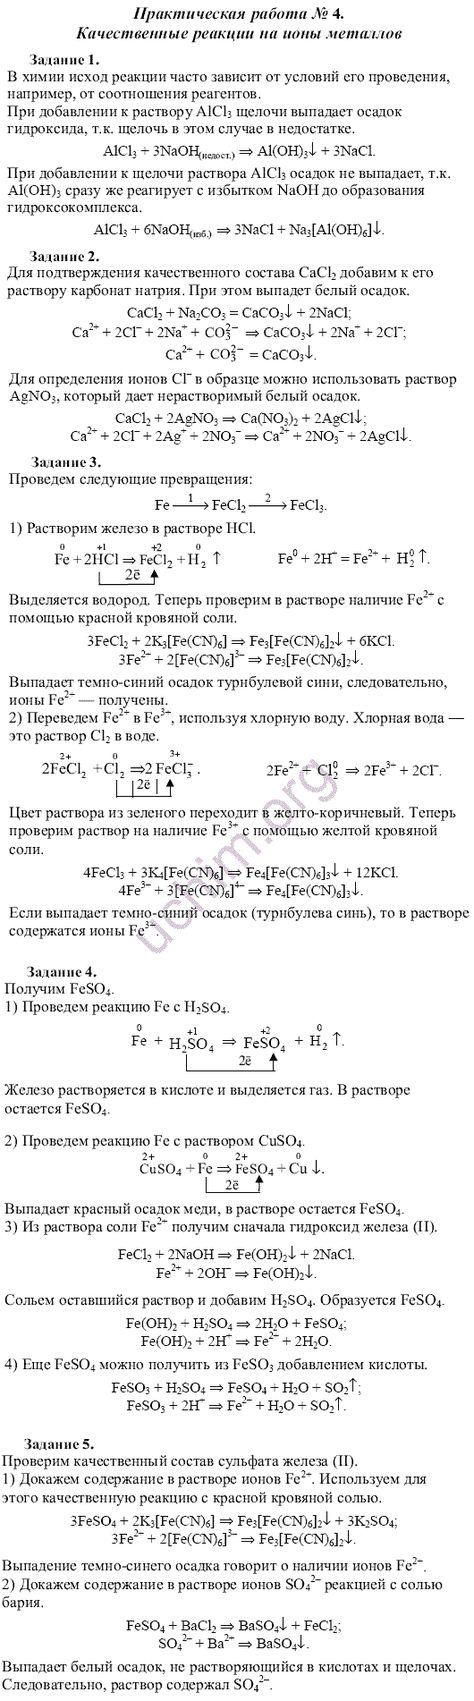 The three little pigs перевод текста на русский учебник карпюк5 класс